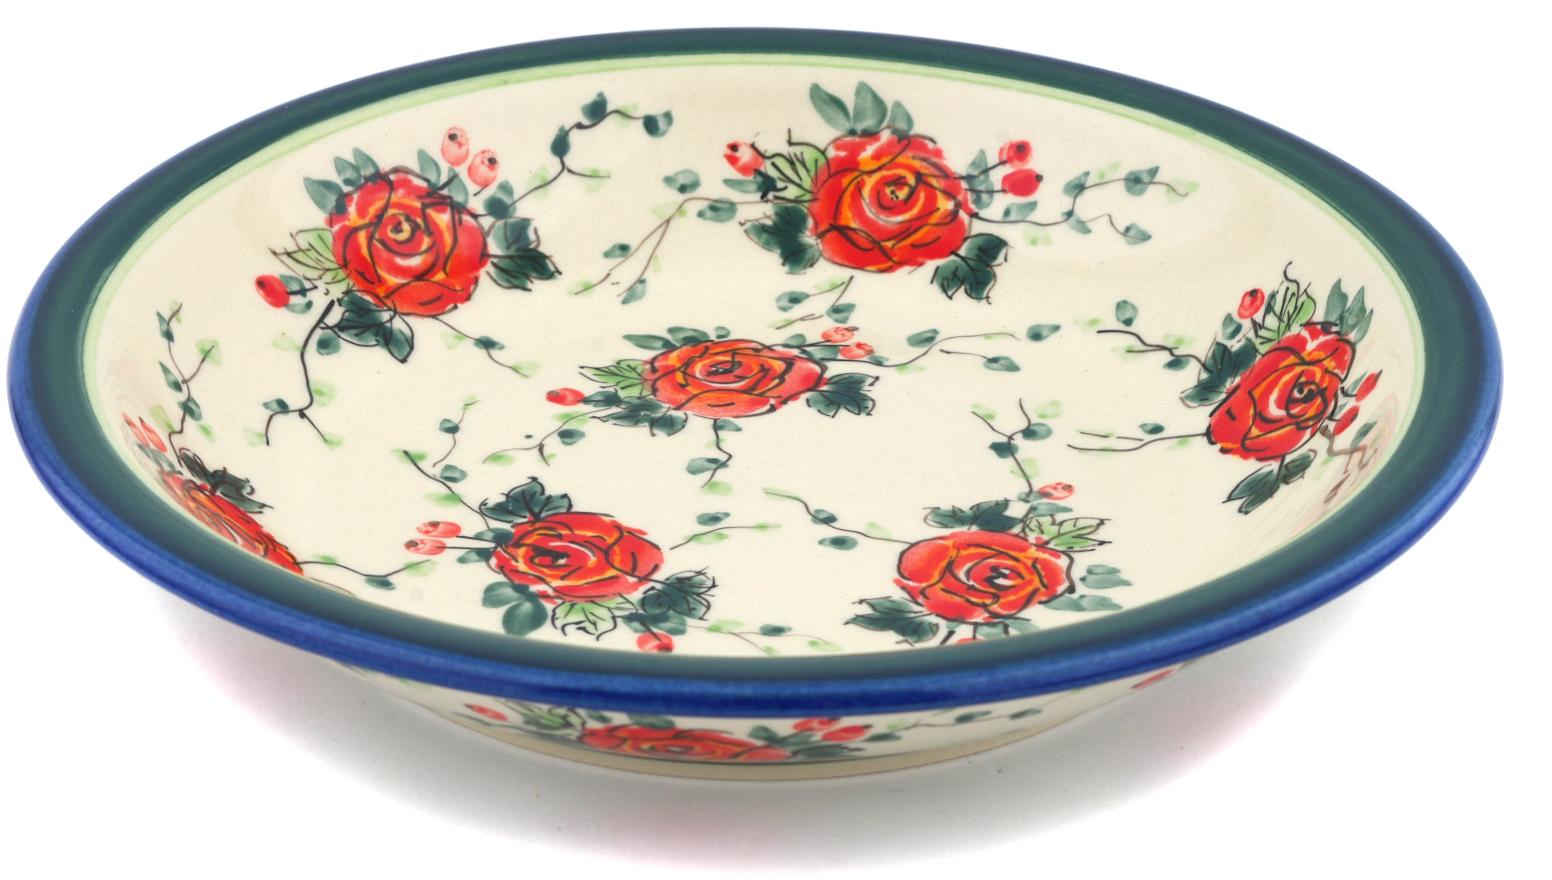 Polish Pottery 9-inch Pasta Bowl (Polish Roses Theme) Signature UNIKAT Hand Painted in Boleslawiec, Poland +... by Zaklady Ceramiczne